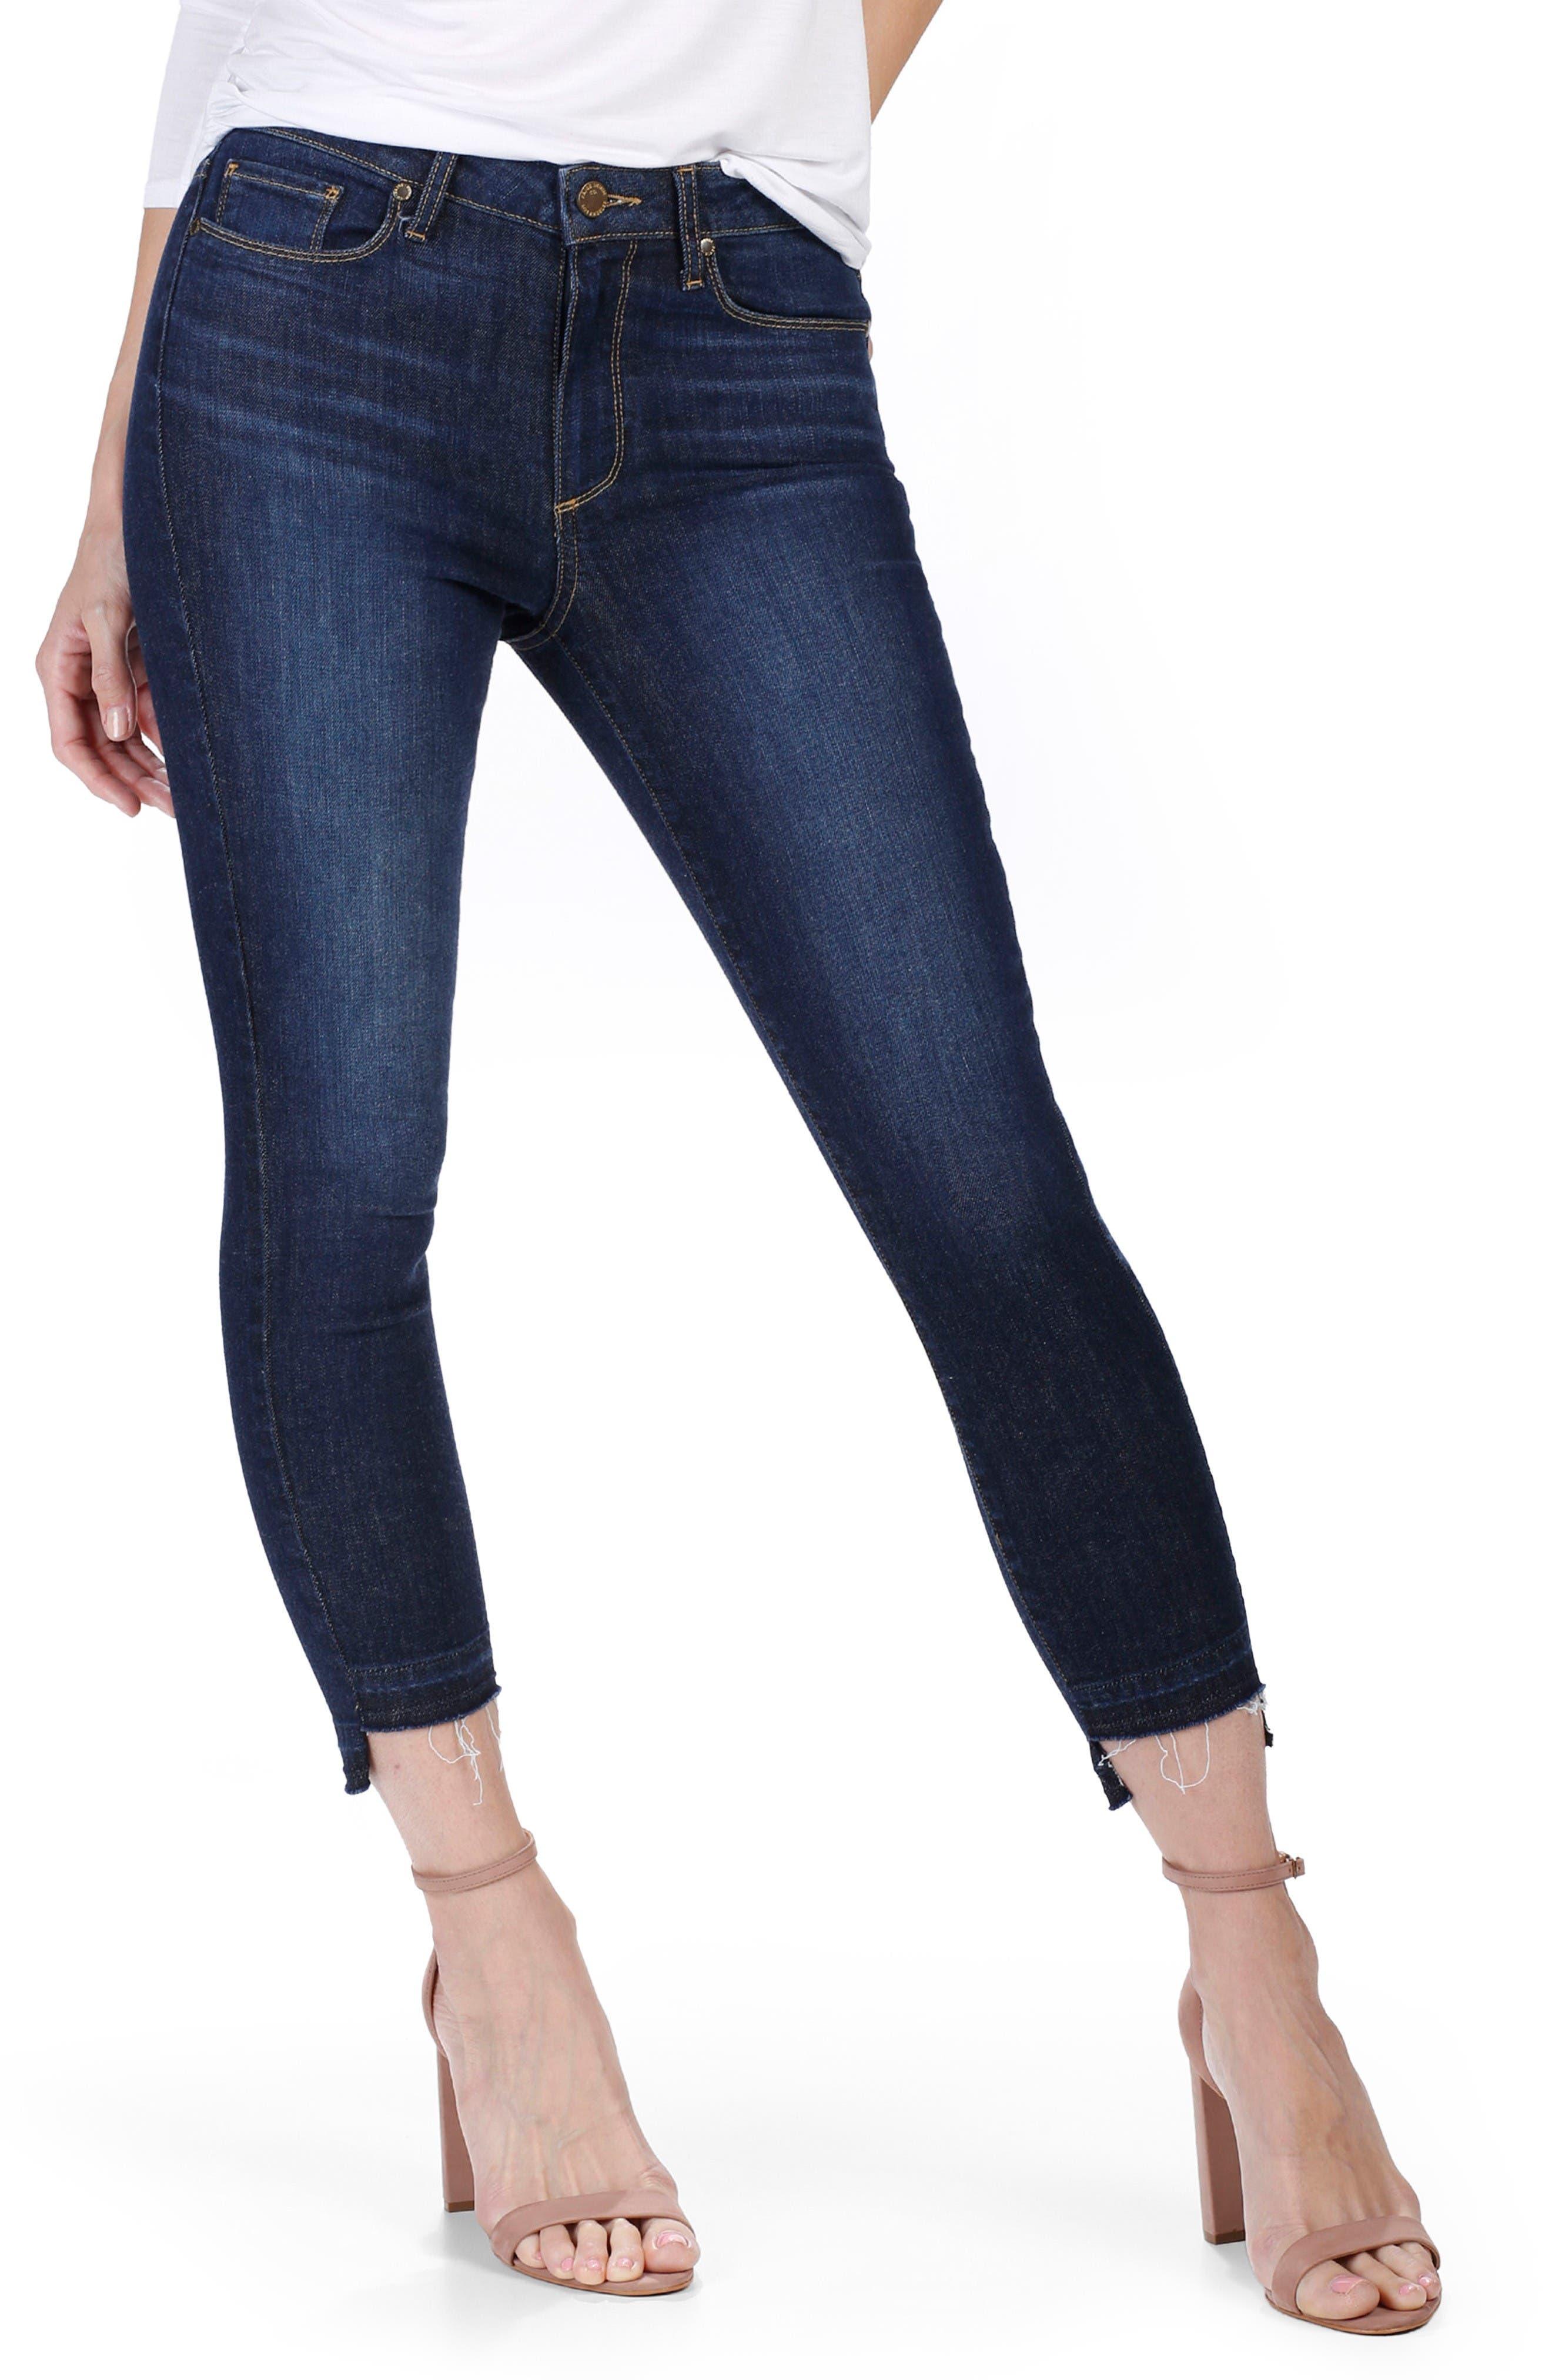 Hoxton High Waist Crop Ultra Skinny Jeans,                         Main,                         color, Emery